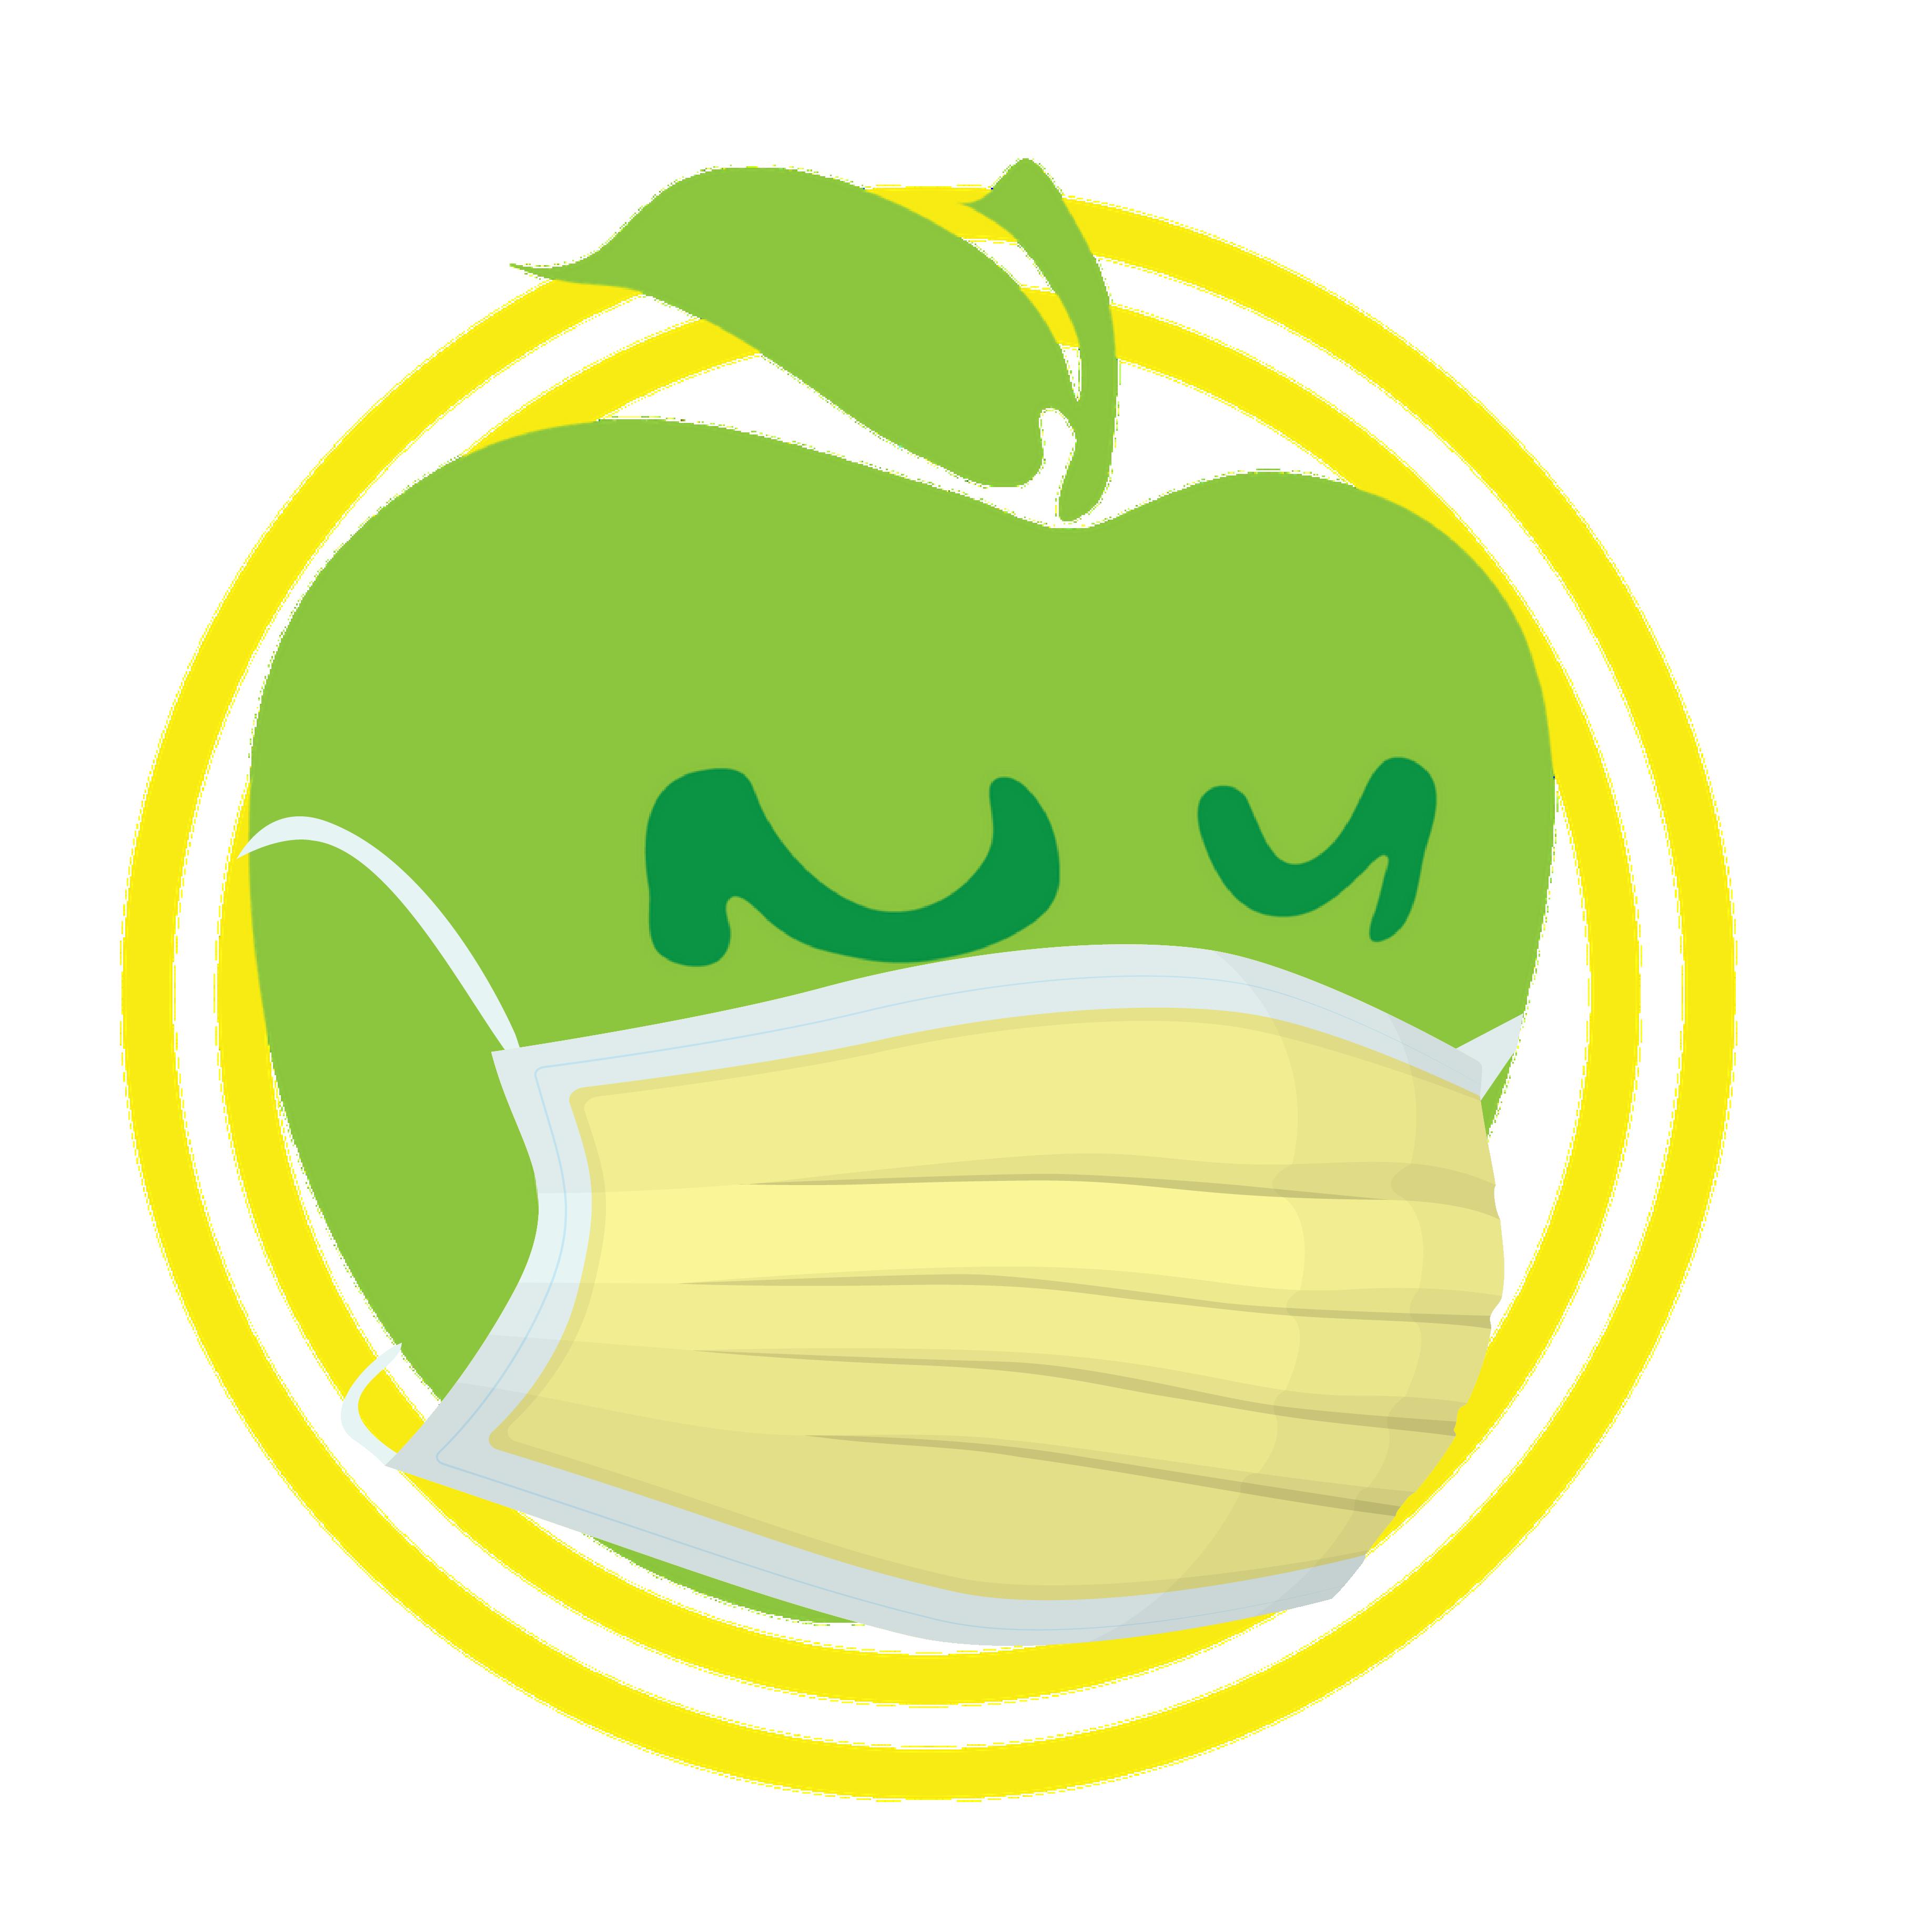 Apple Logo with Yellow Mask